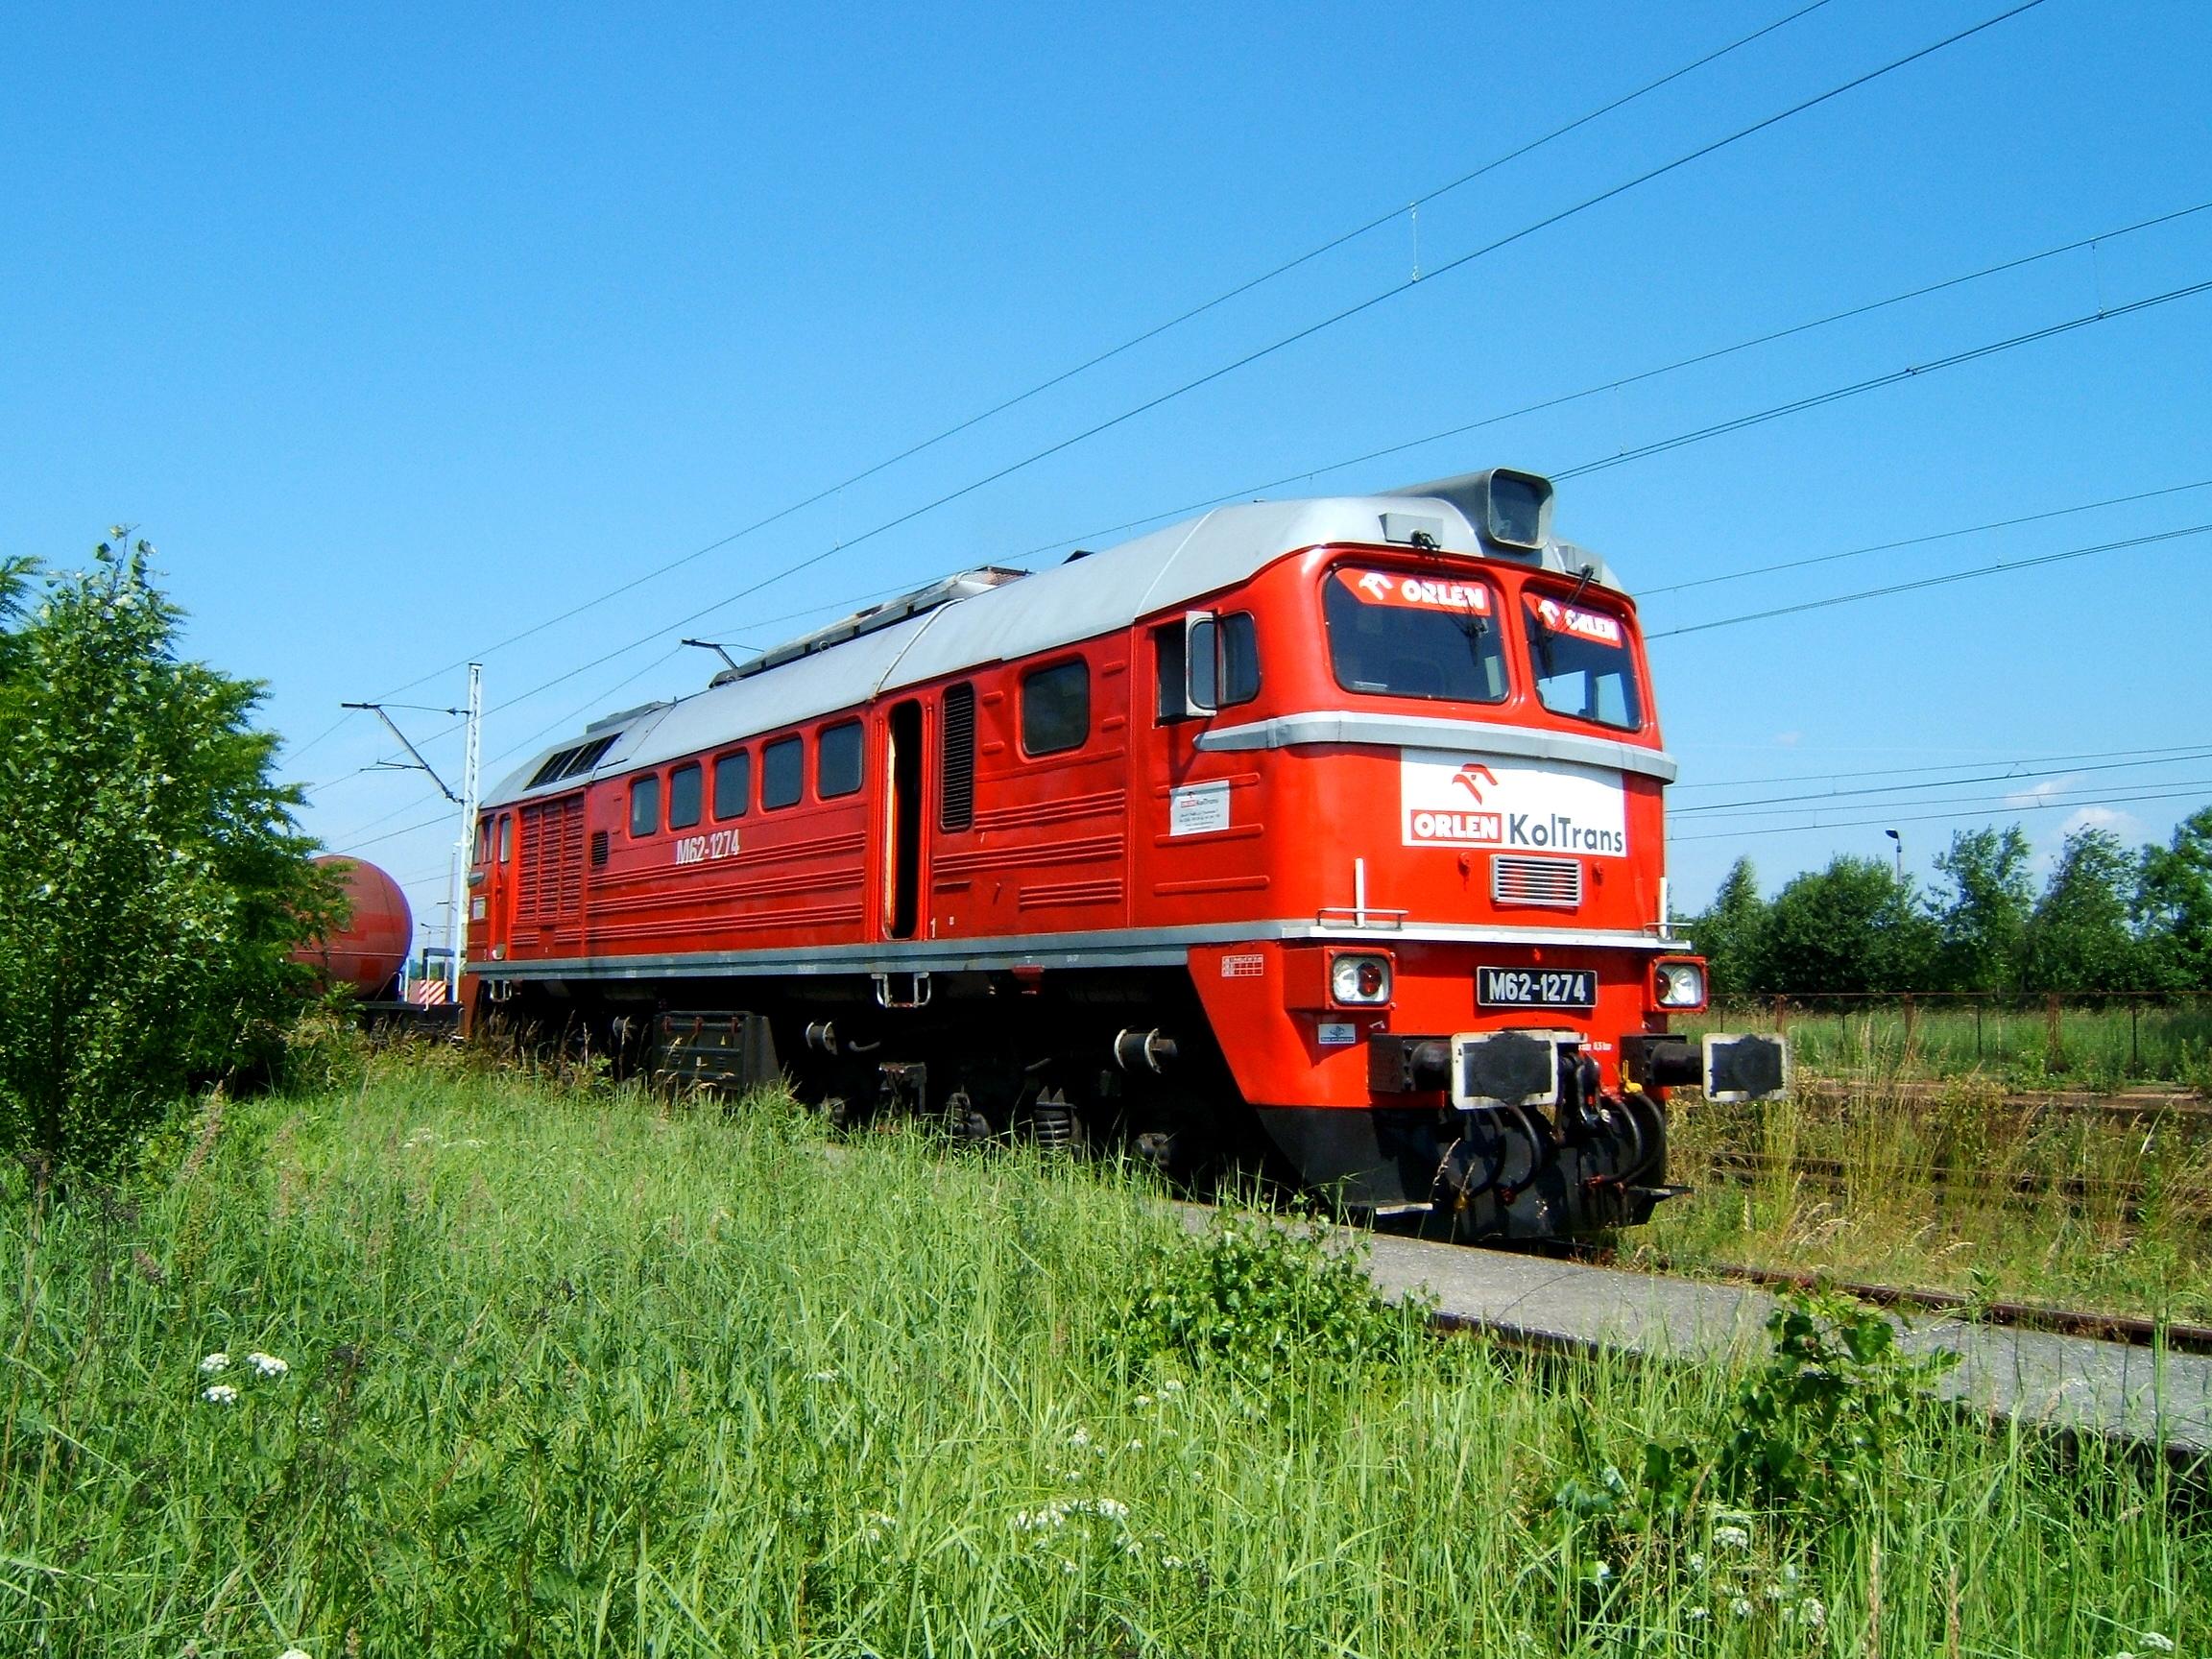 File:M62-1274 Orlen KolTrans Naklo Slaskie 20062008 01.jpg